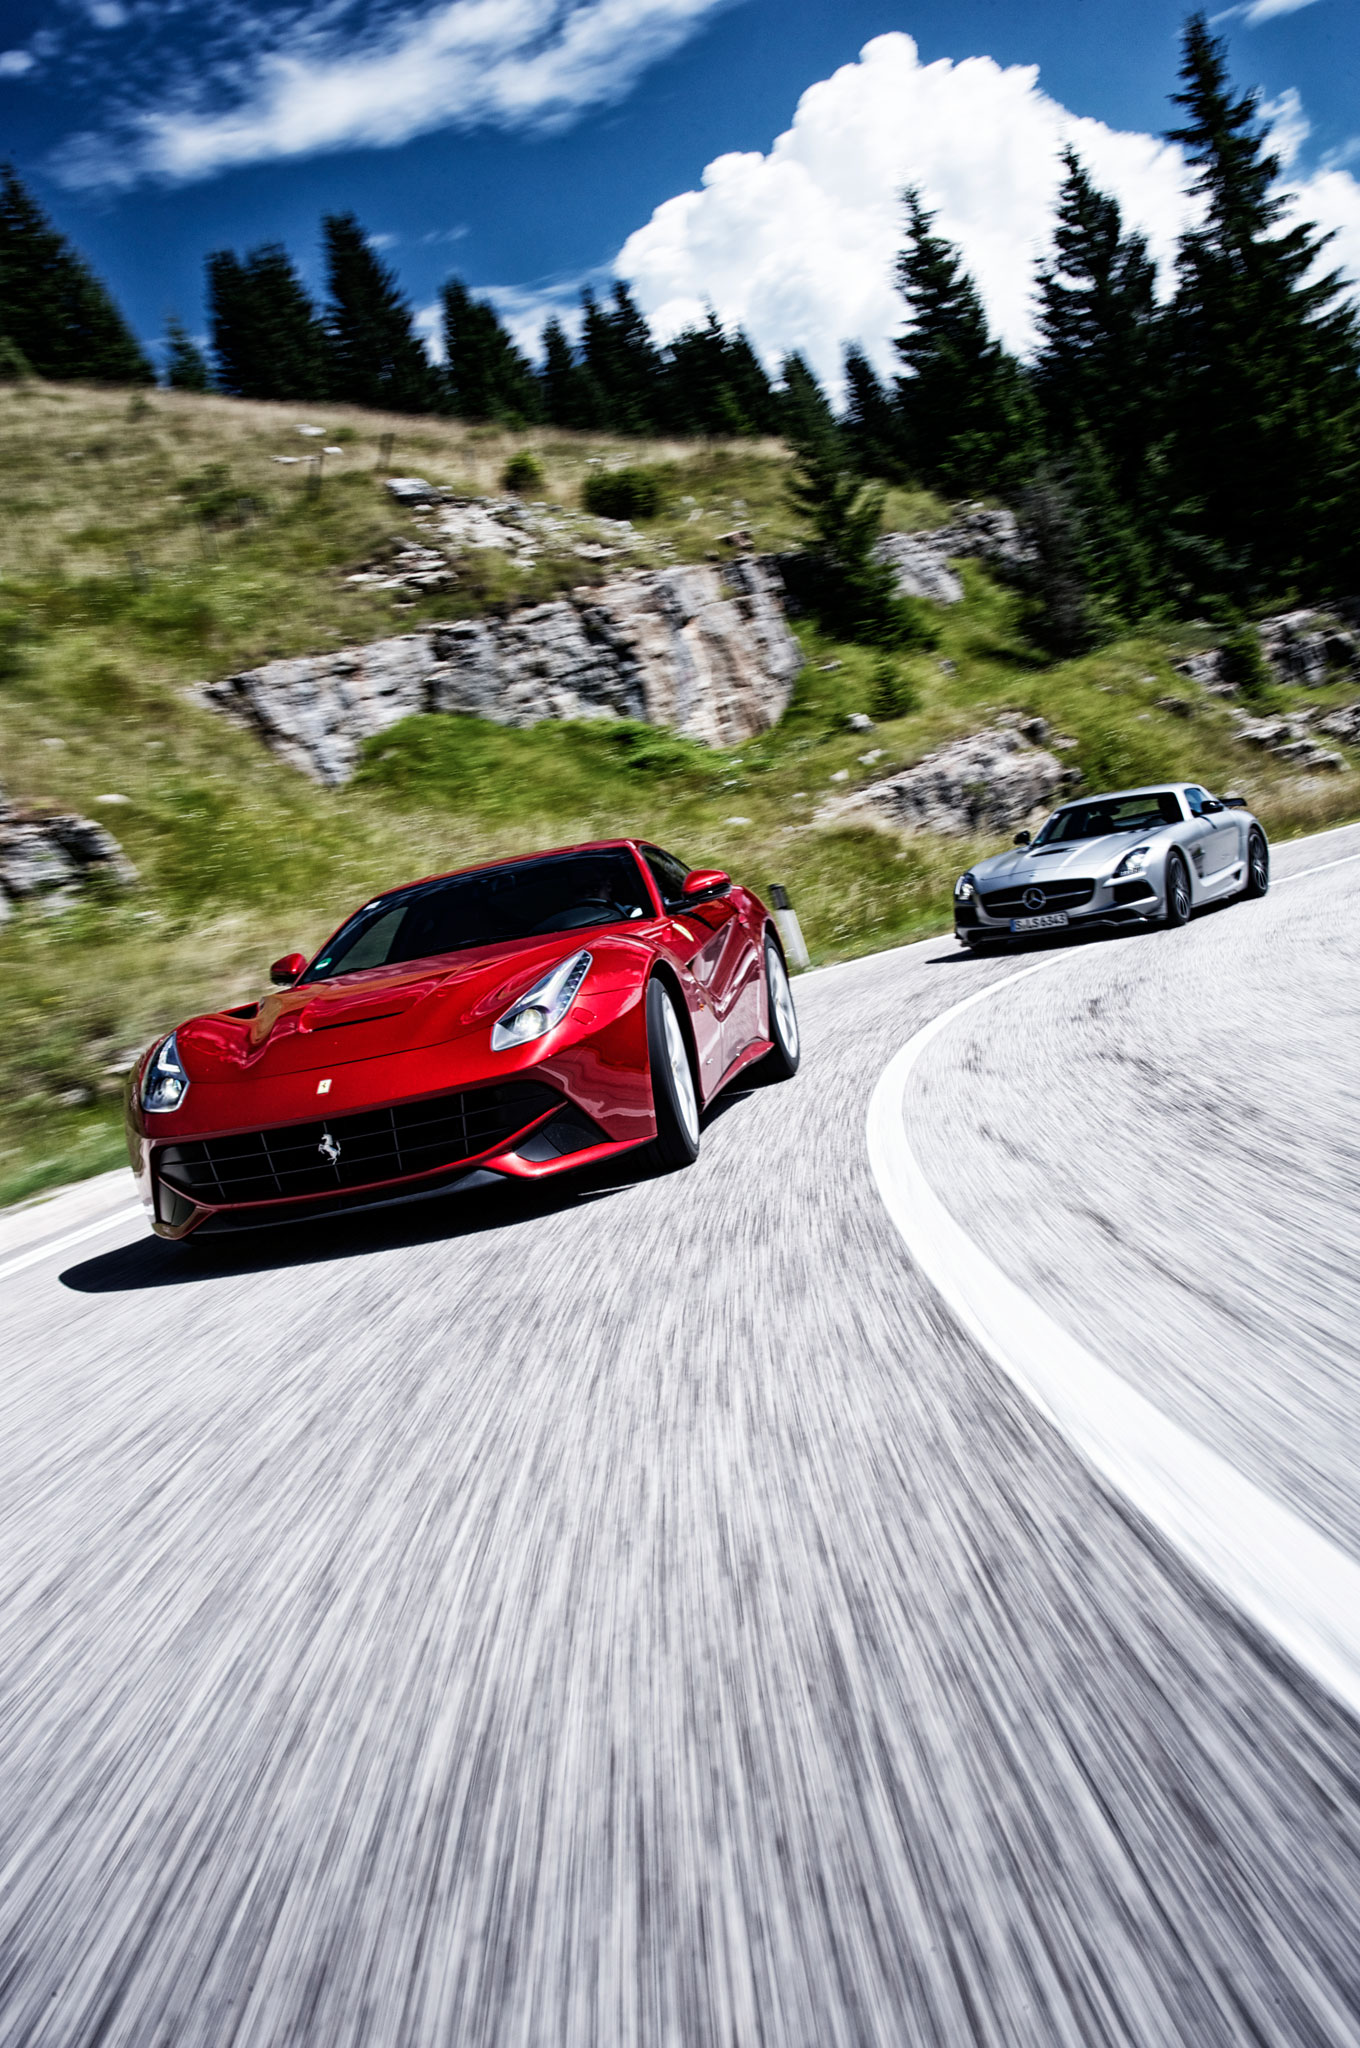 200 Kph To Mph >> Ferrari F12 Berlinetta vs Mercedes-Benz SLS AMG Black ...